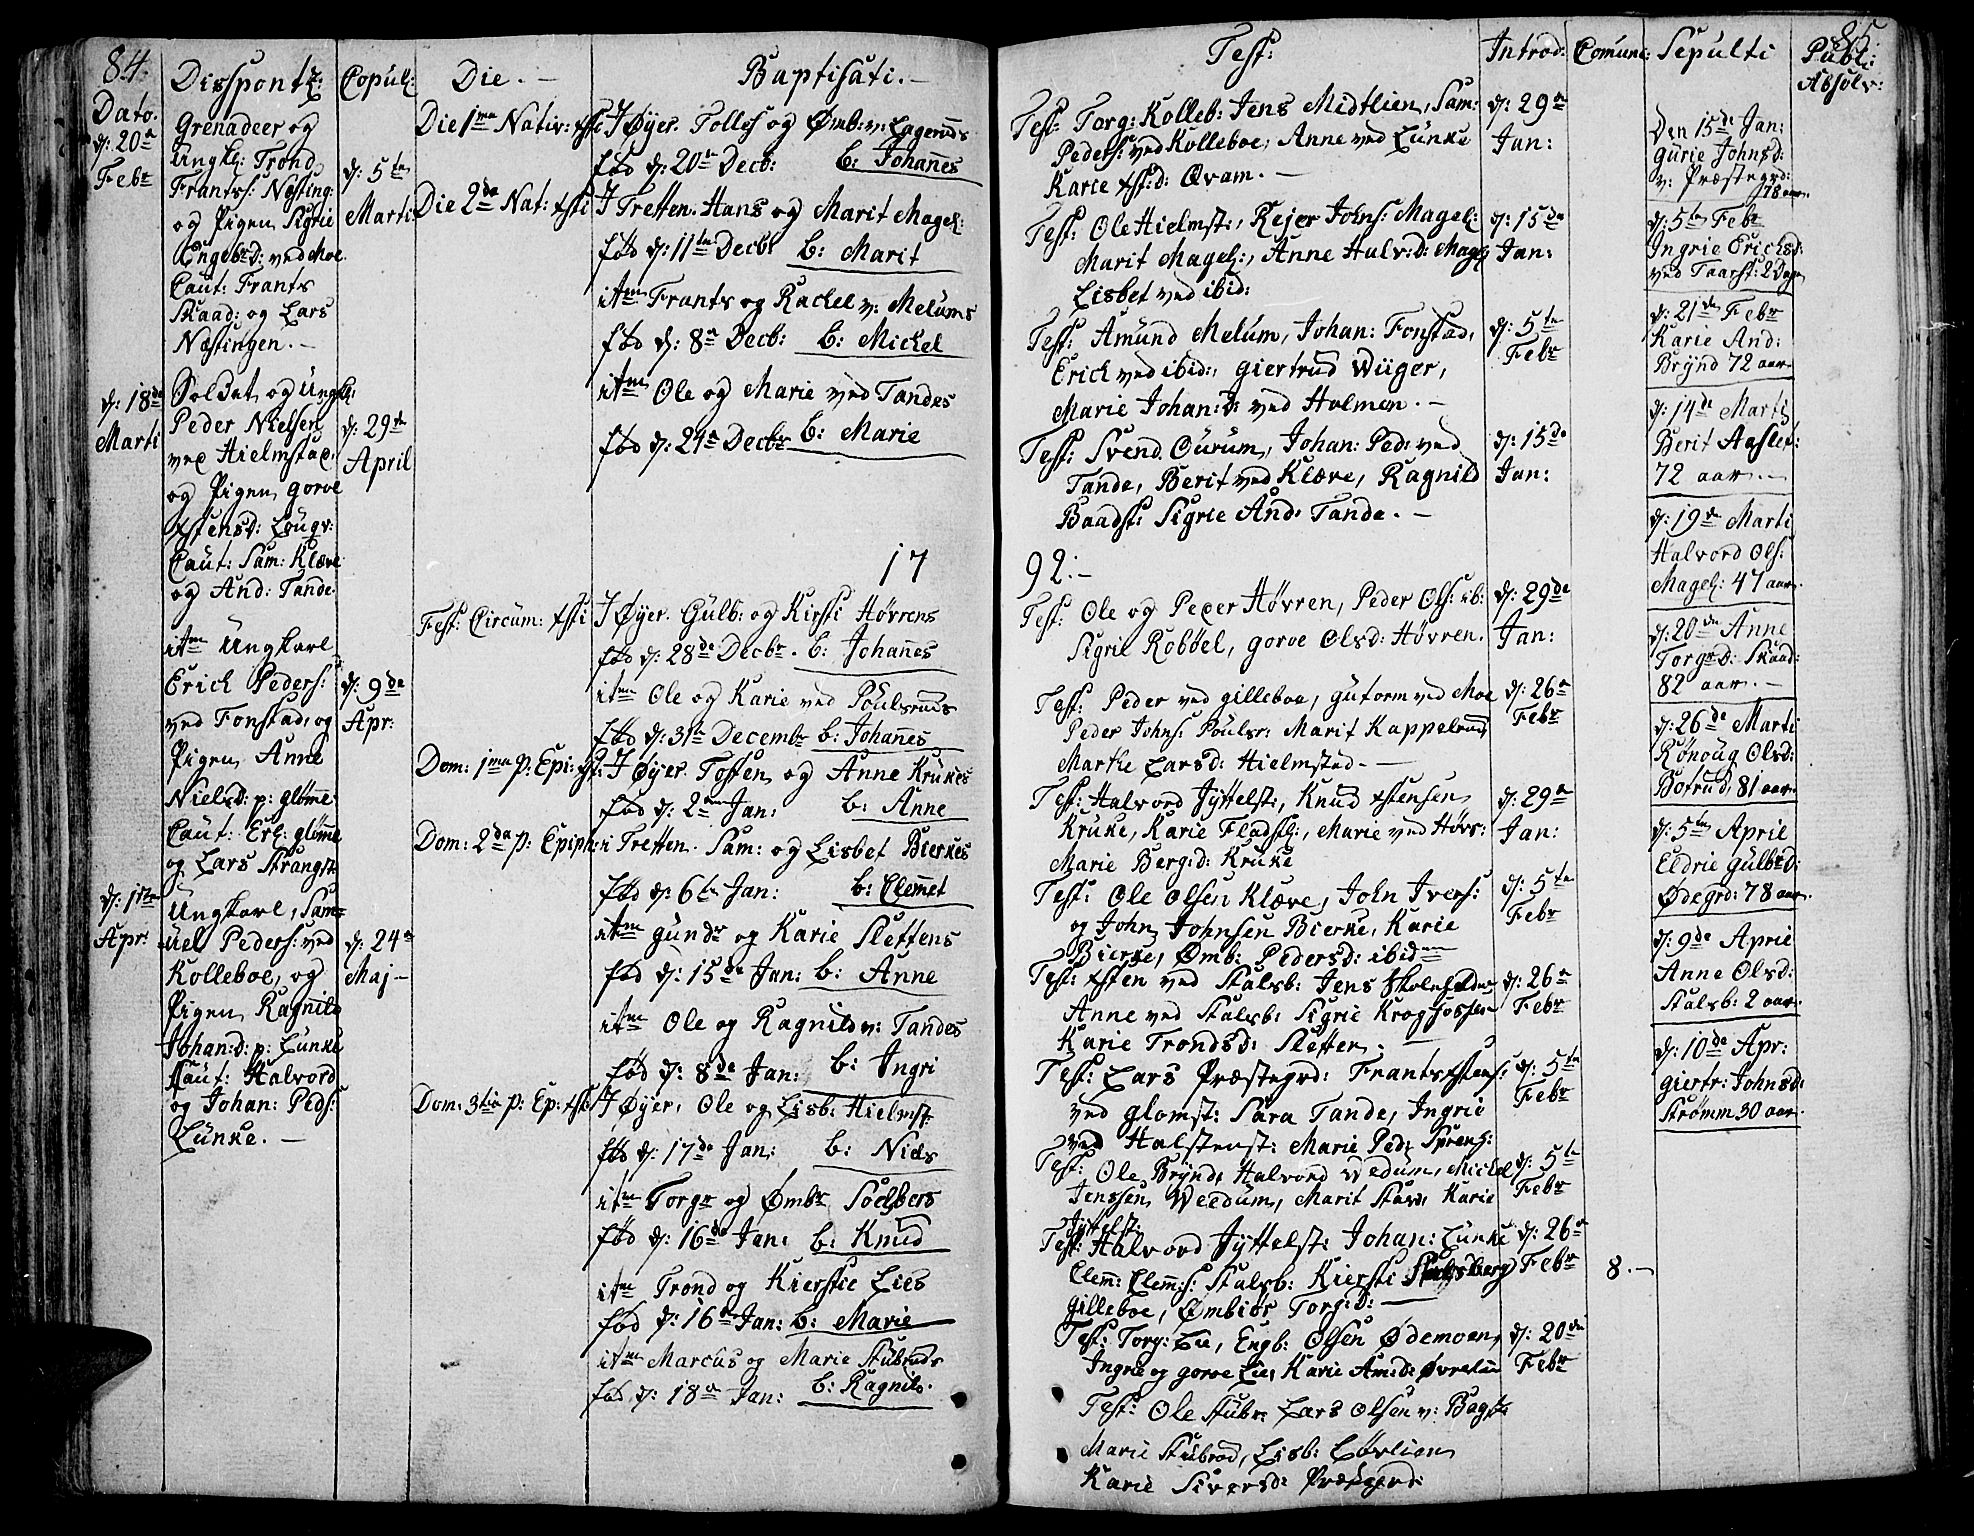 SAH, Øyer prestekontor, Ministerialbok nr. 3, 1784-1824, s. 84-85